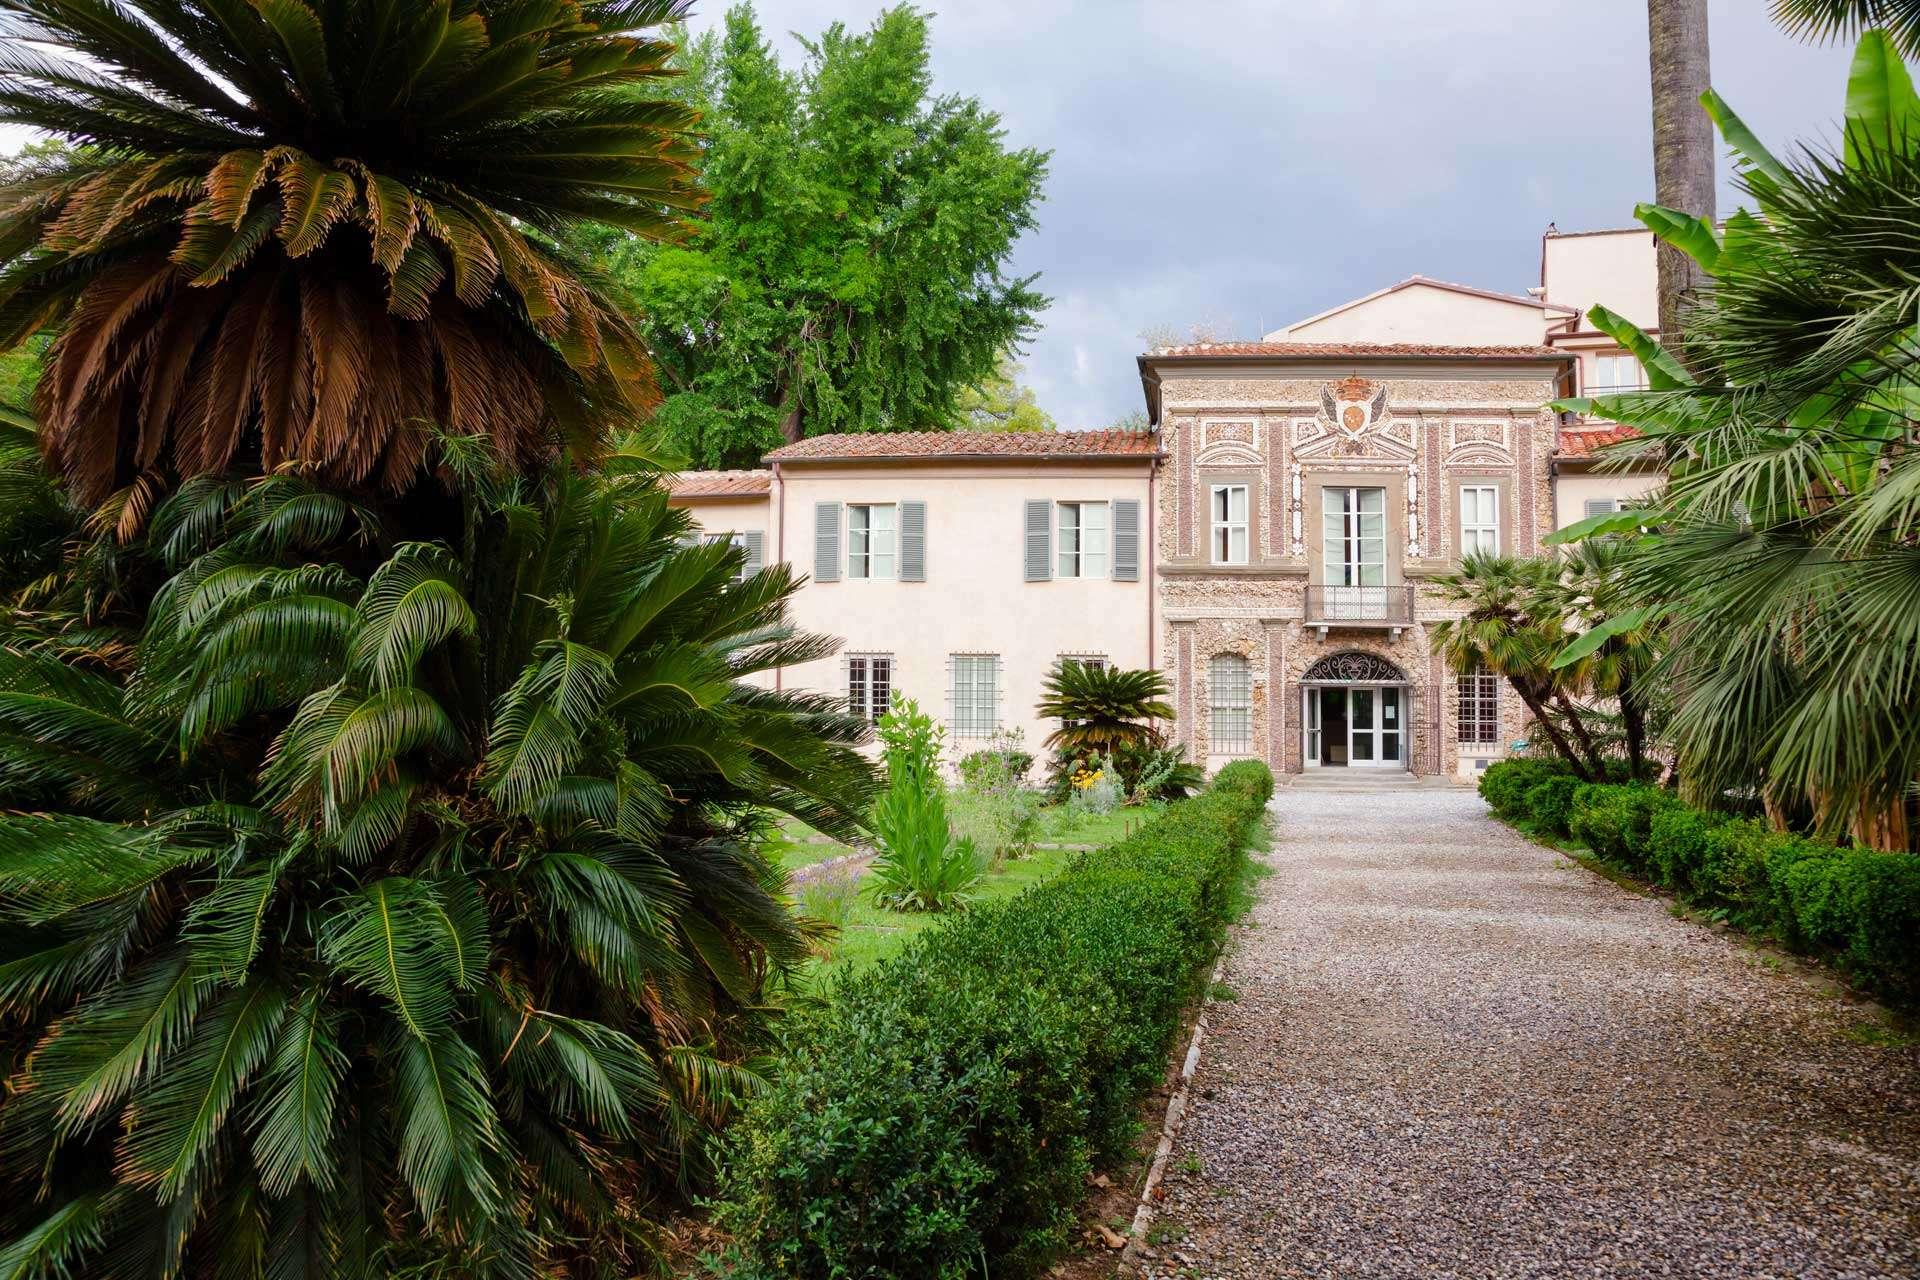 Visiting Pisa's Botanical Garden